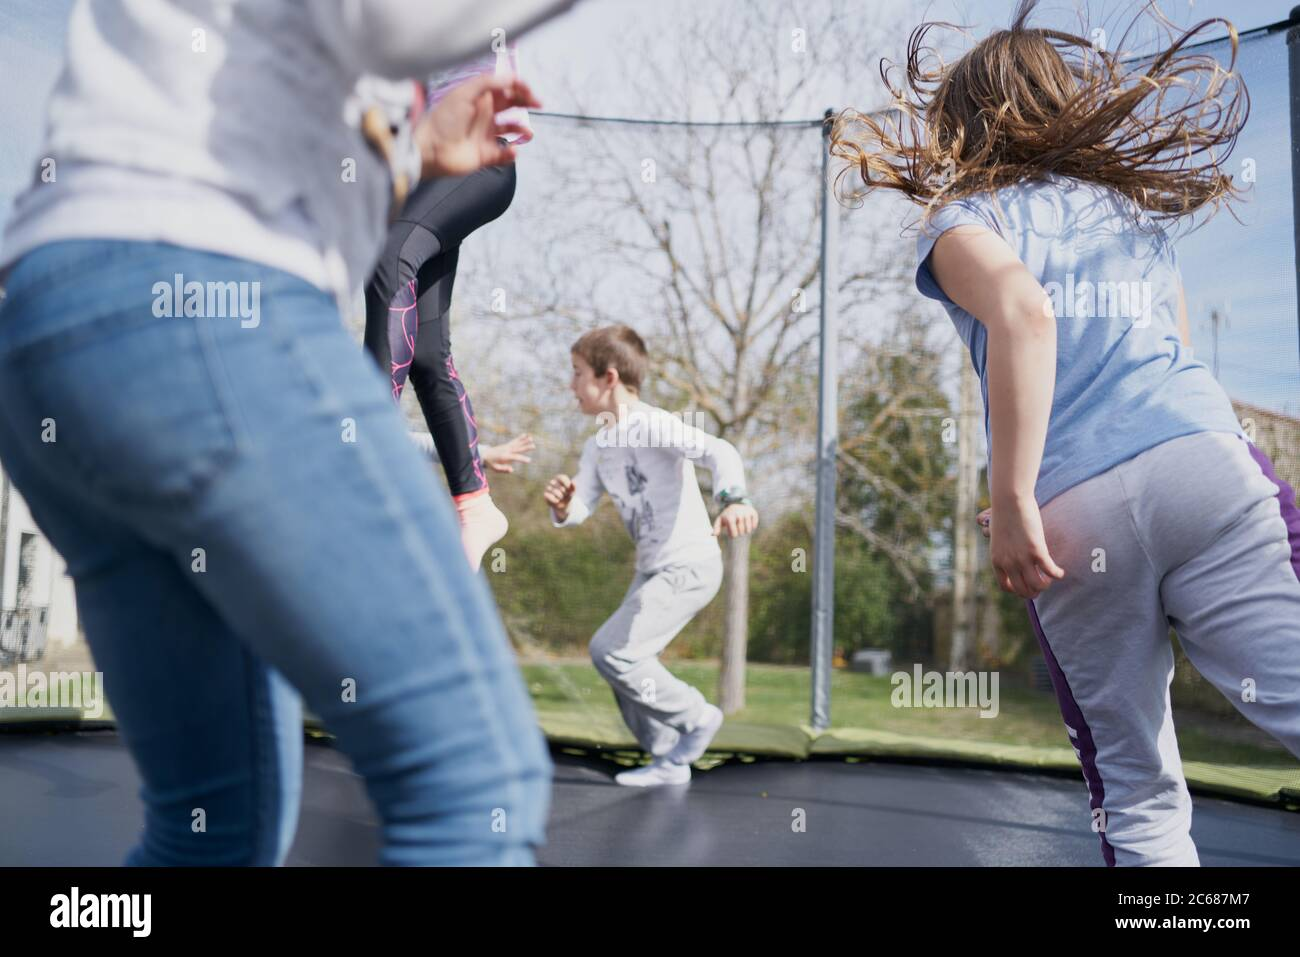 Children And Trampoline Group Fotos E Imágenes De Stock Alamy